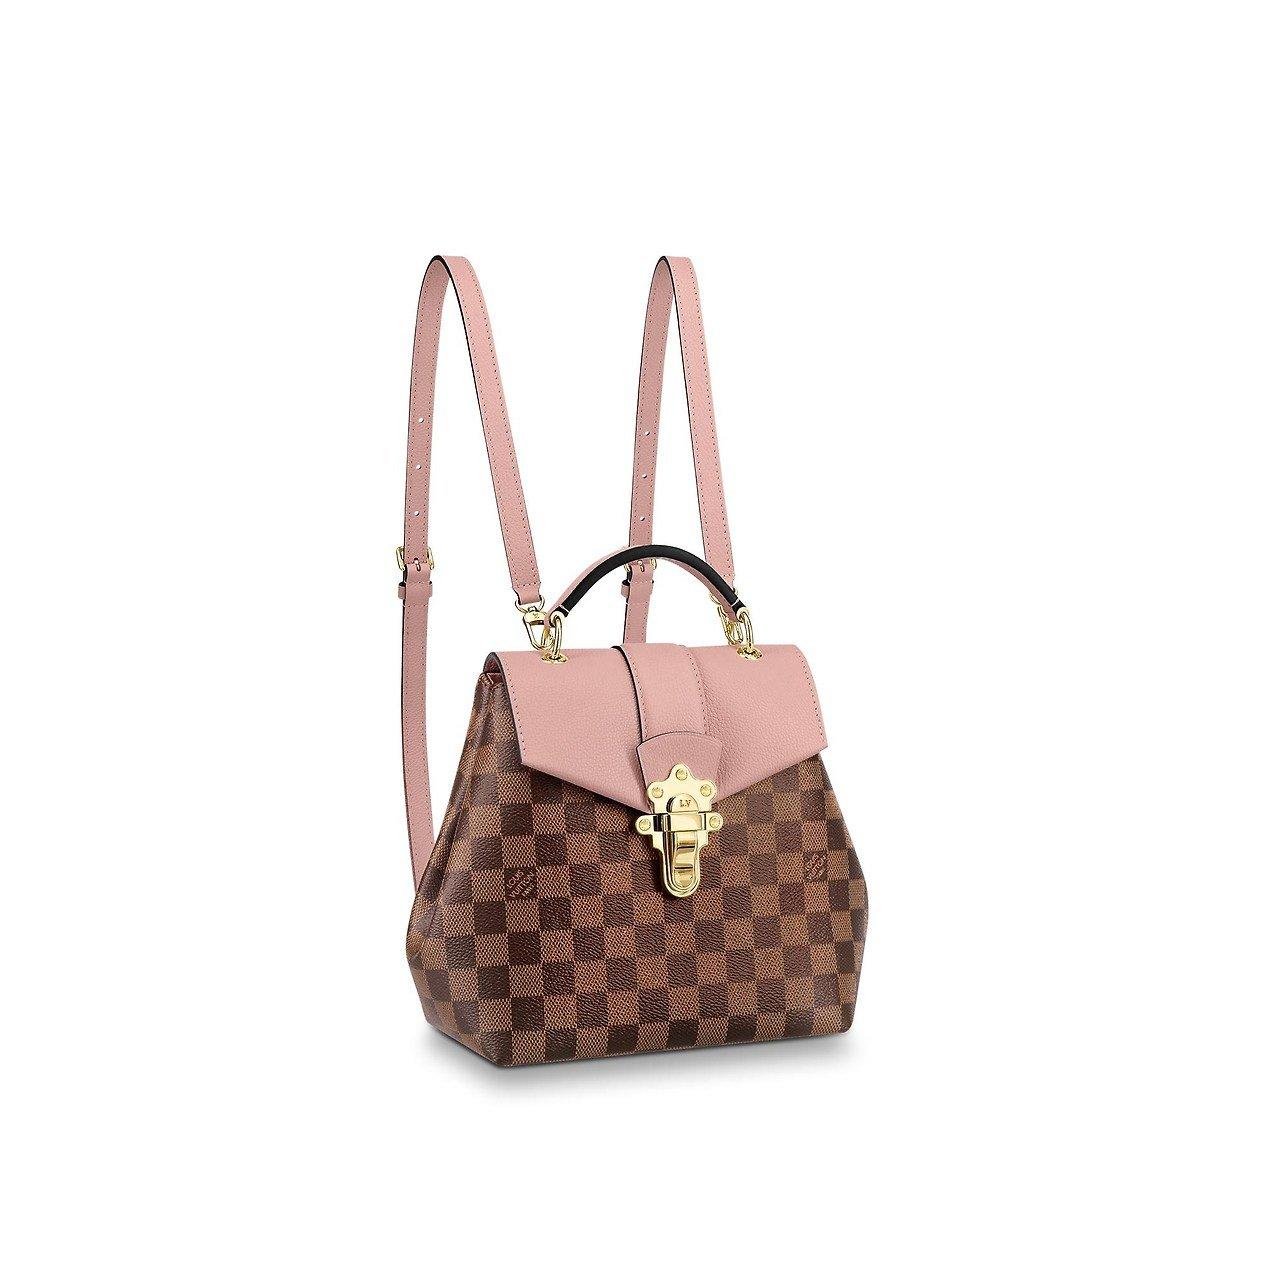 Zaino Louis Vuitton estate 2019 prezzo 1520 euro